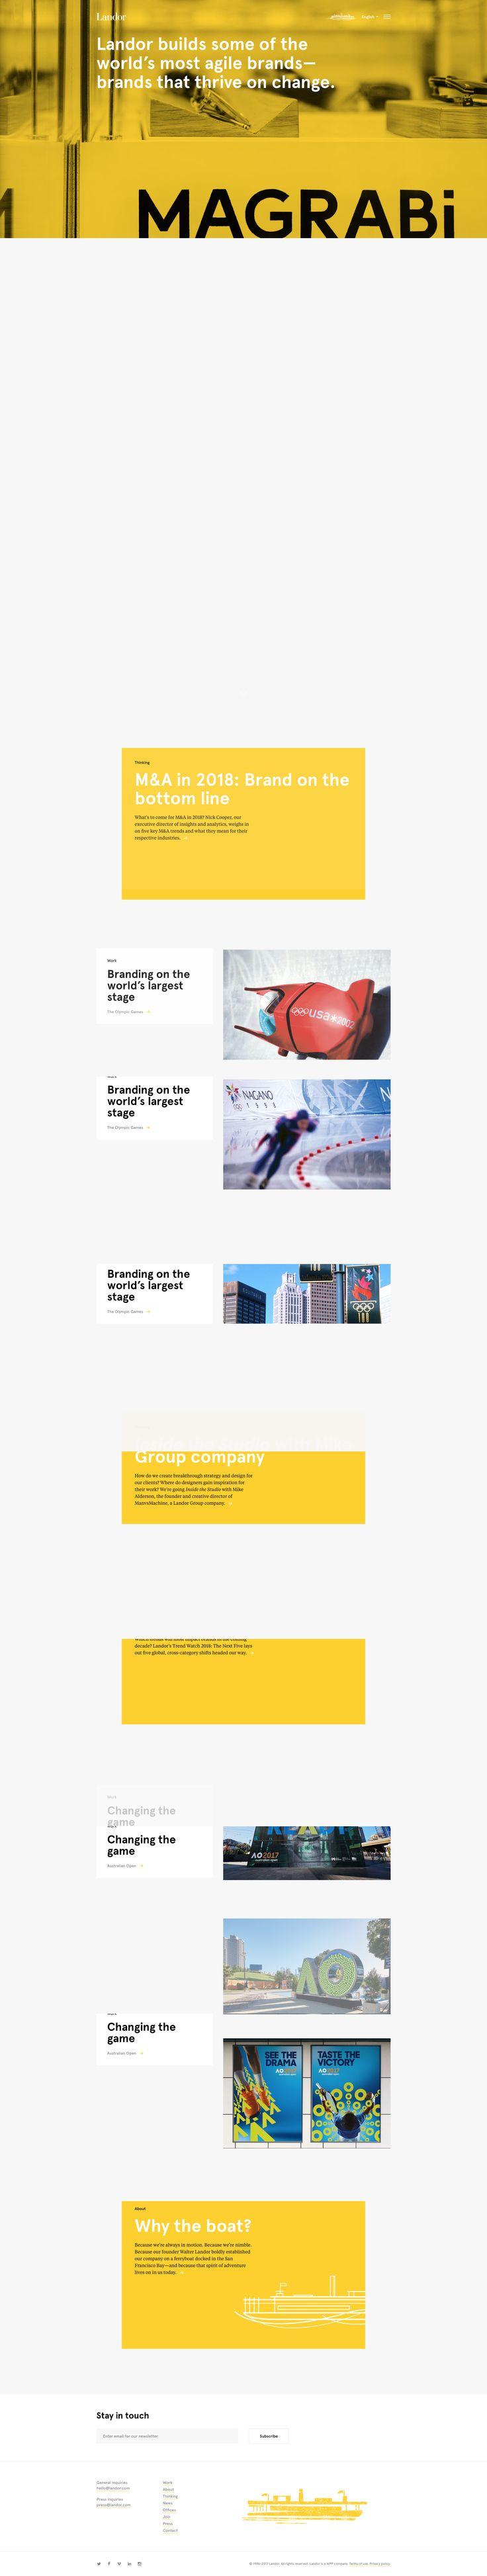 International branding agency site. Interesting scroll transition effect.